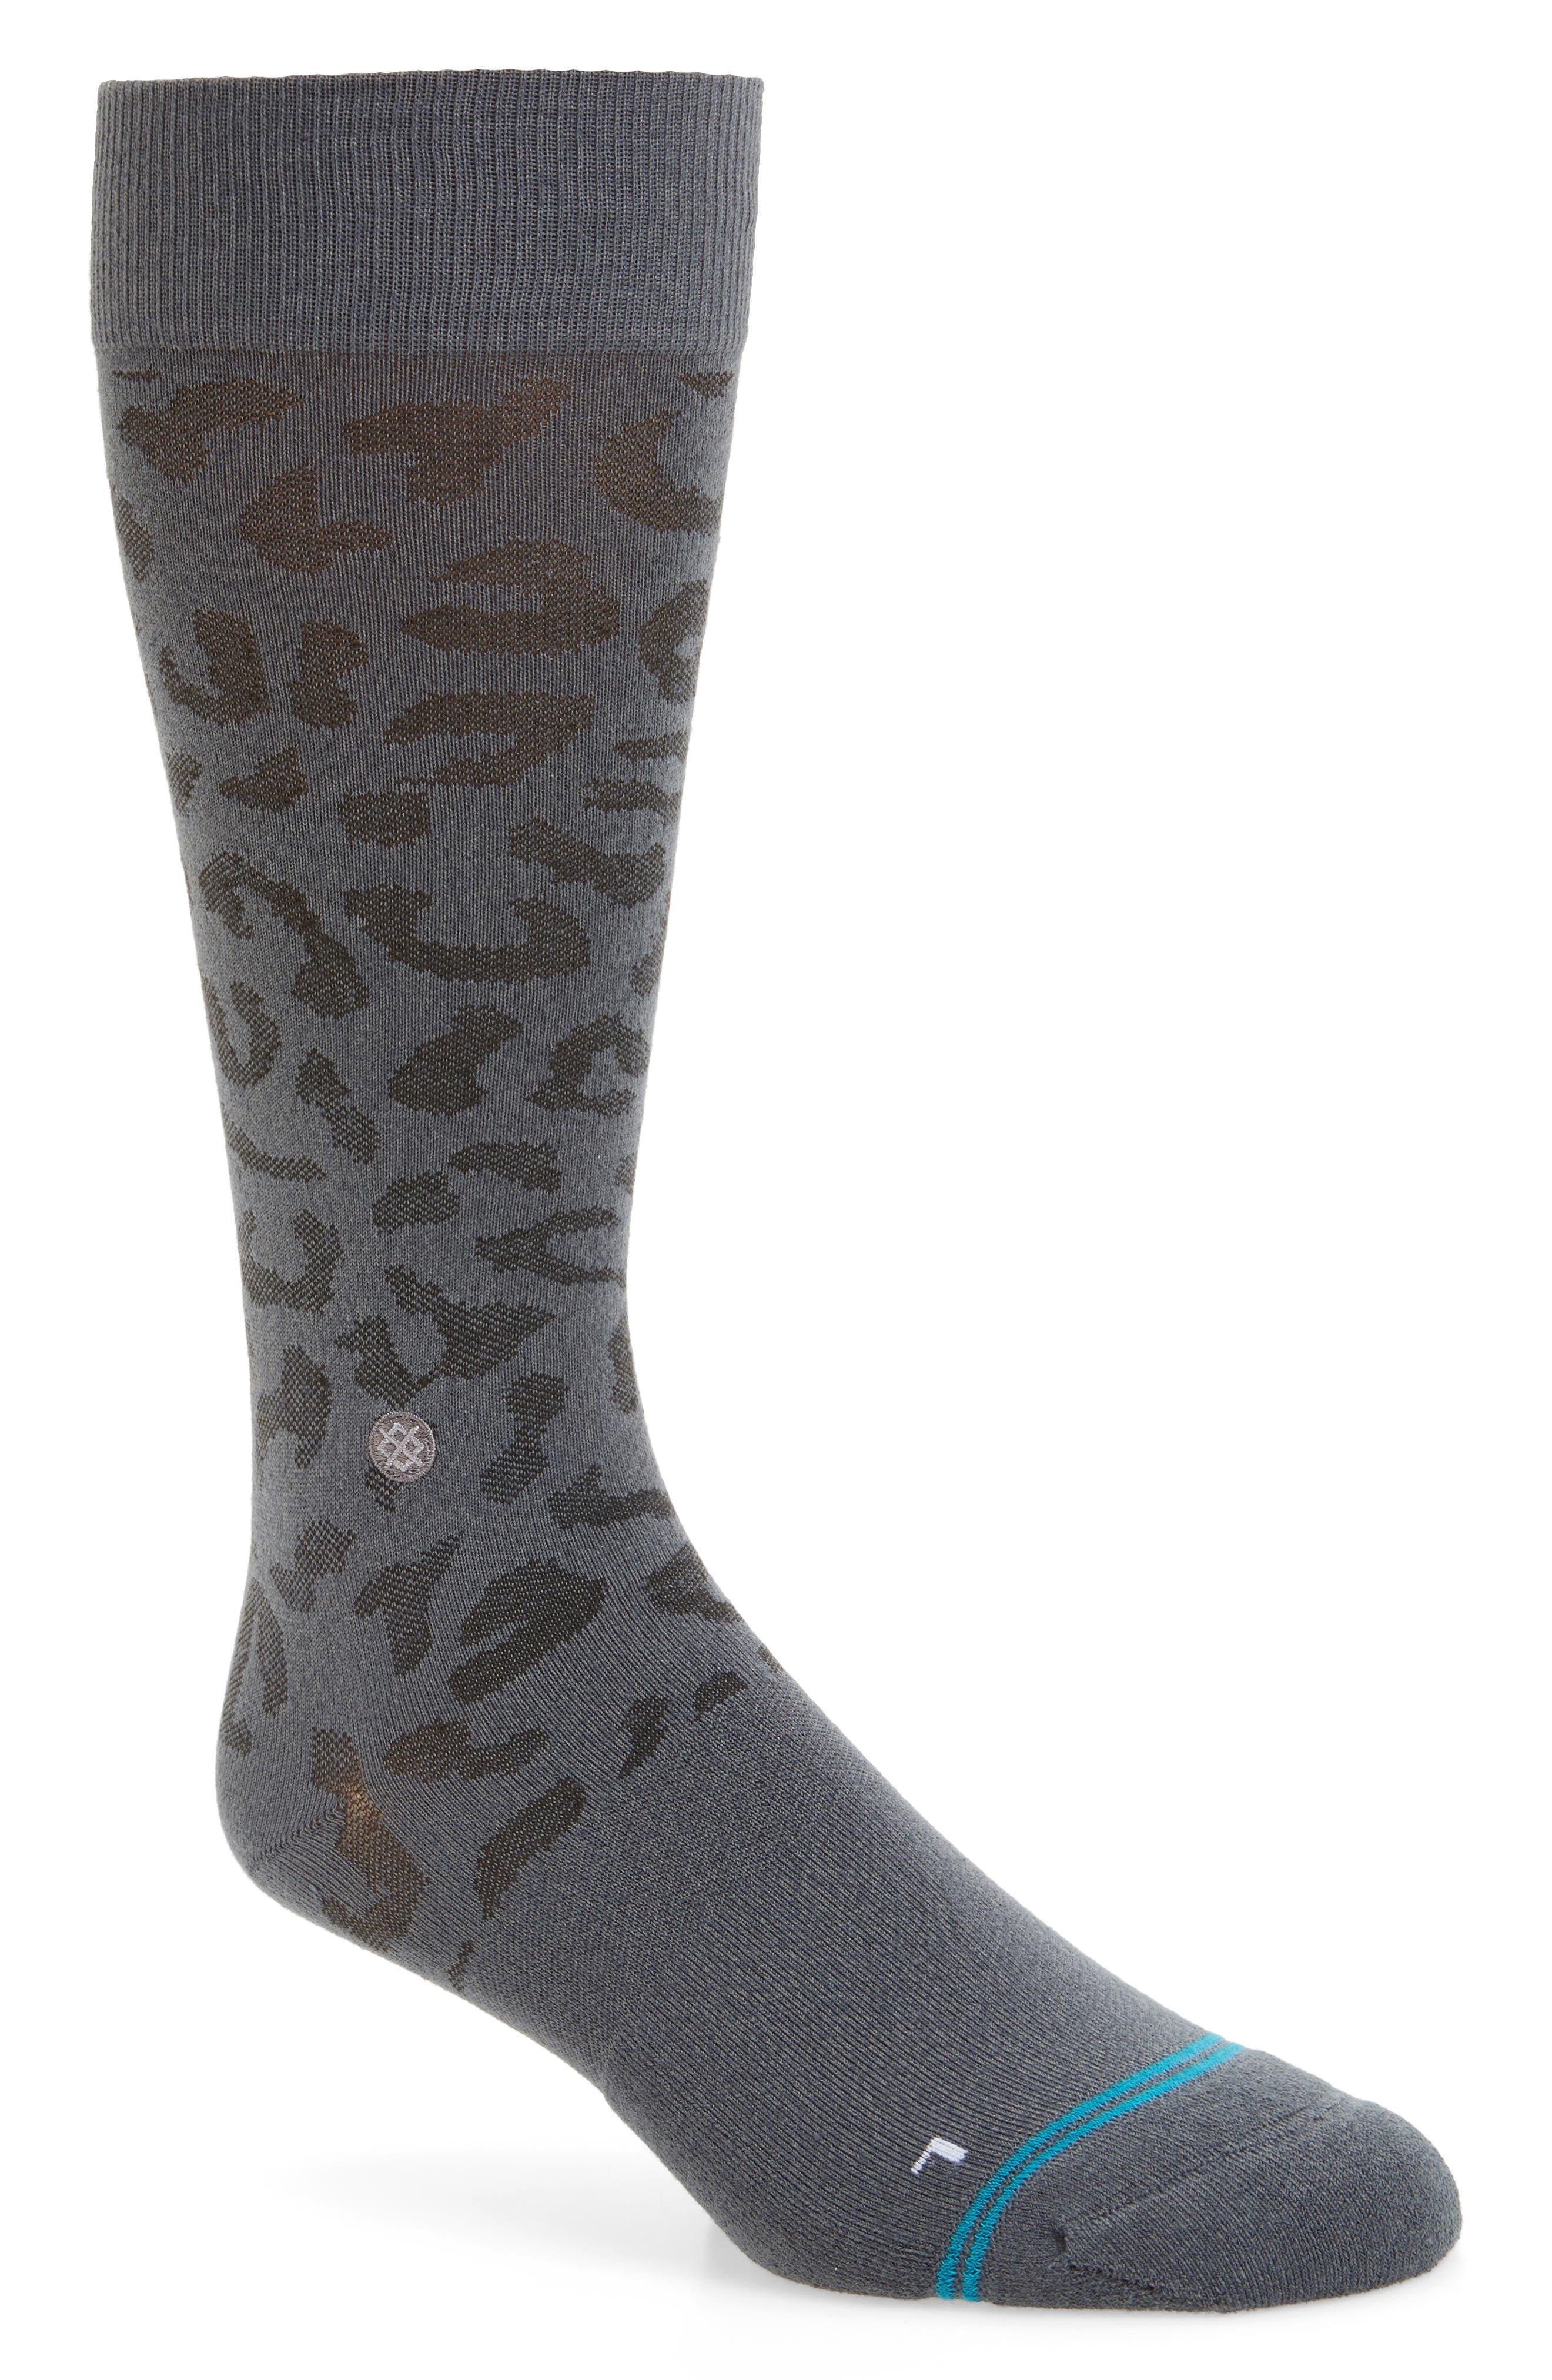 Okaes Socks,                         Main,                         color, 030